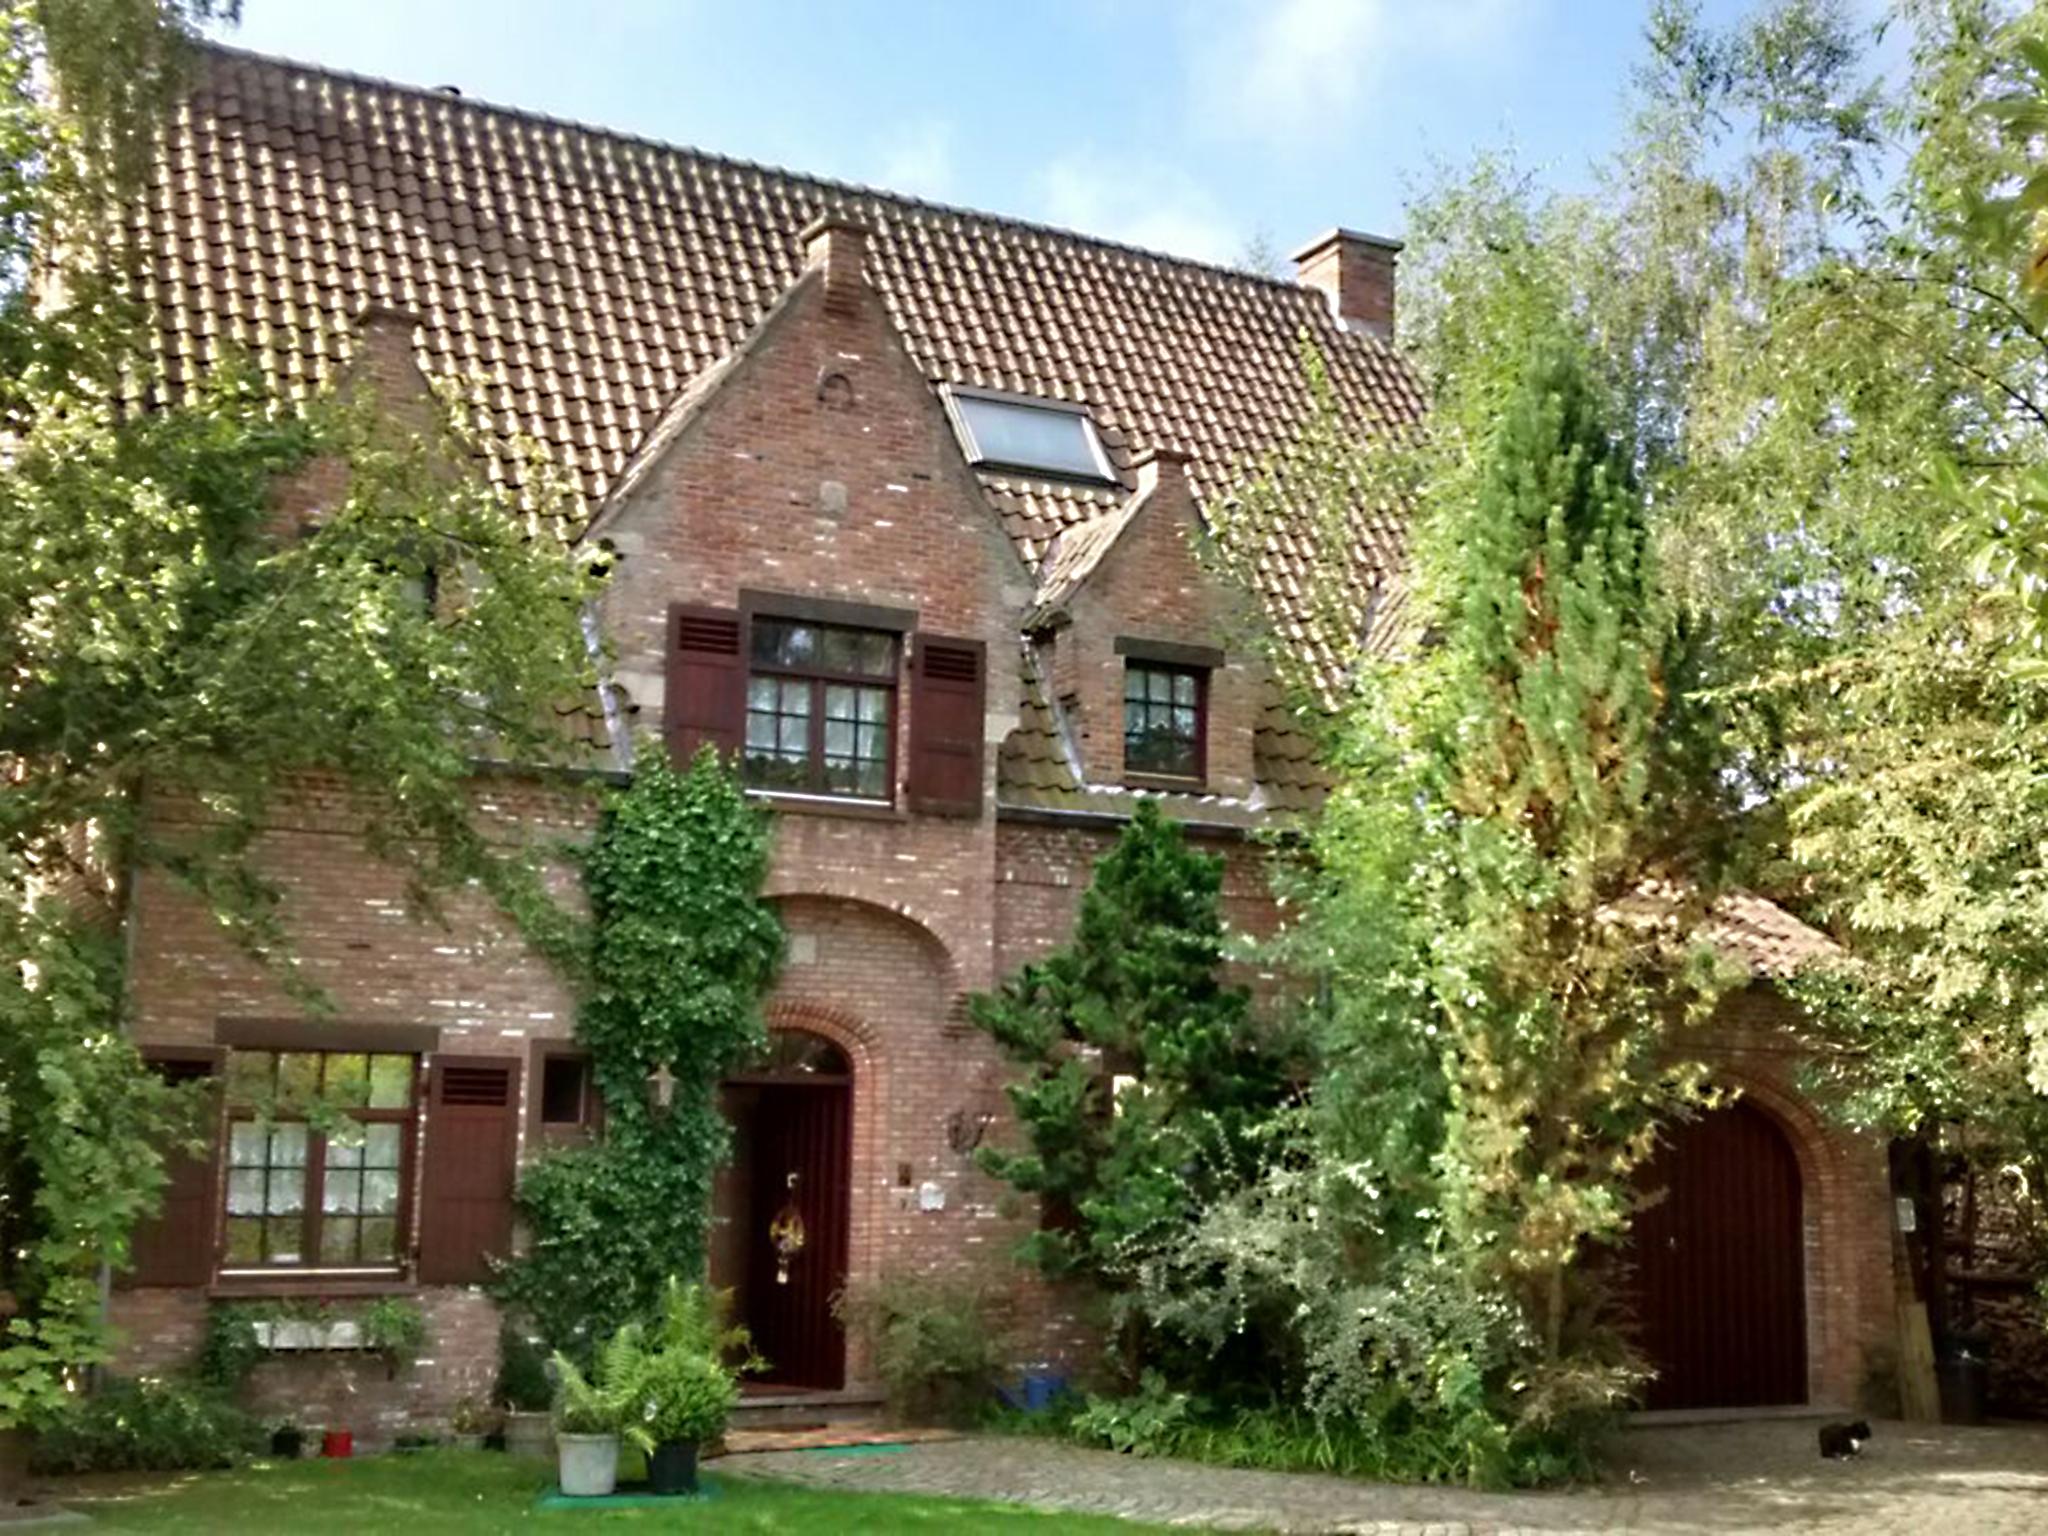 Ferienhaus B & B für Familien (2420981), Wezembeek-Oppem, Flämisch Brabant, Flandern, Belgien, Bild 9